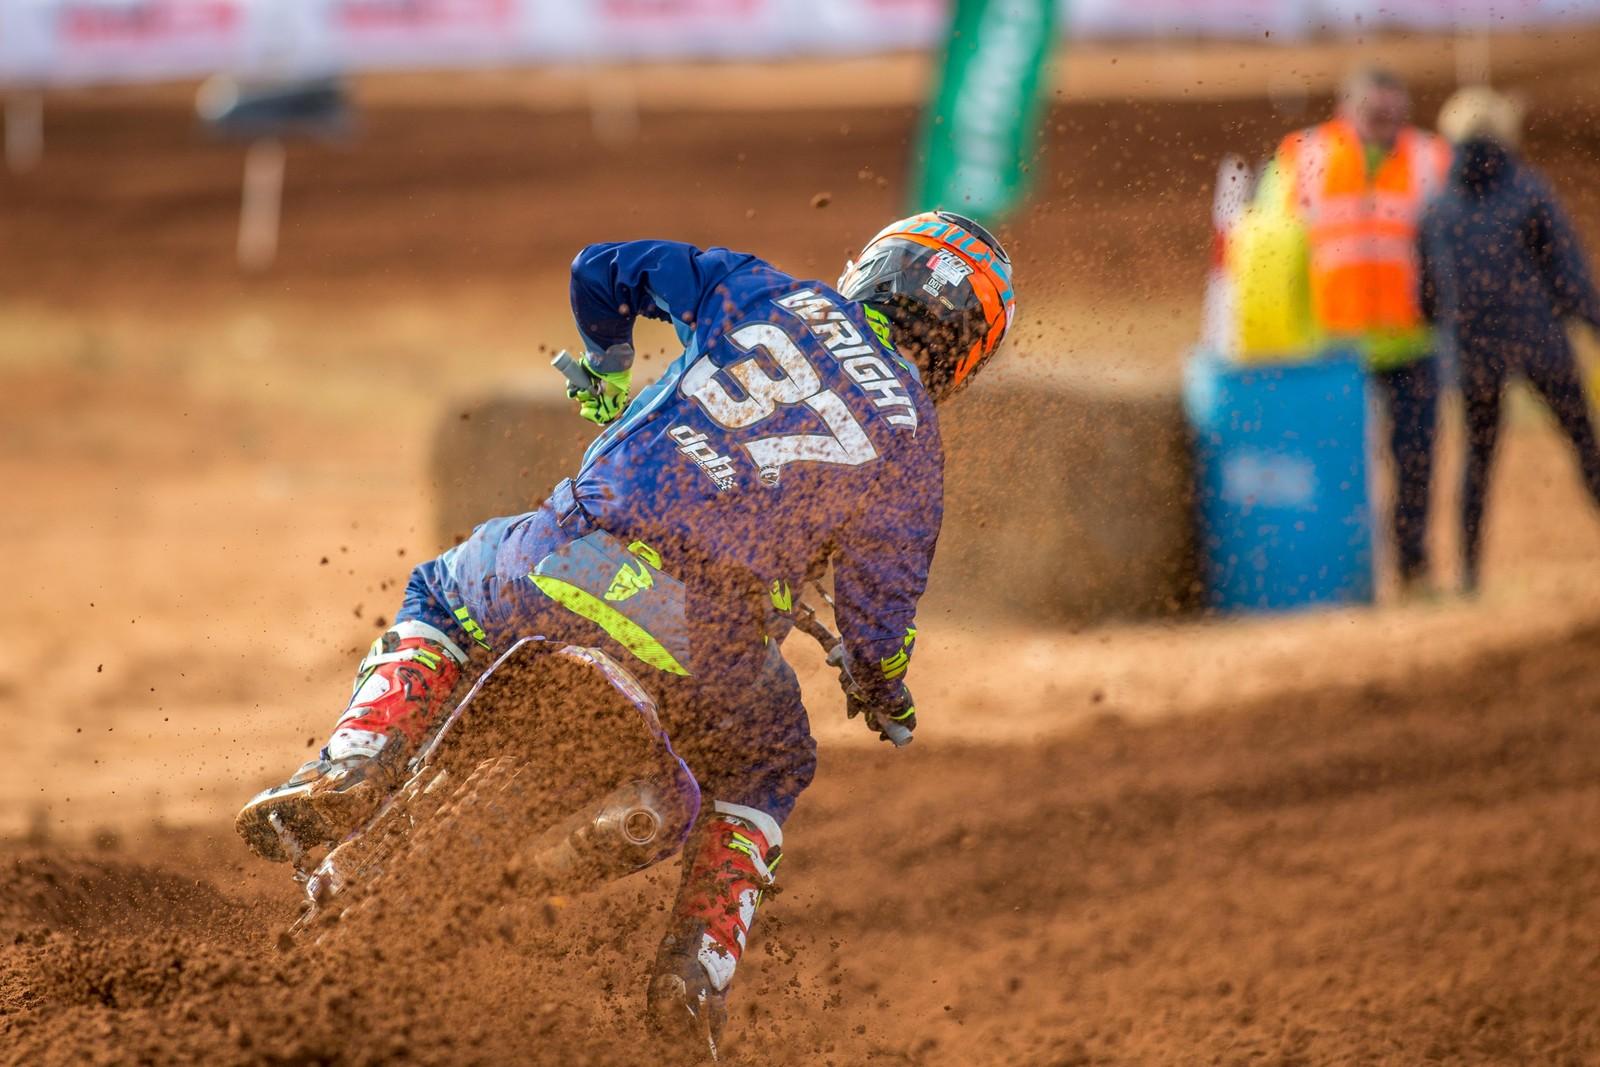 Jacob Wright - Australian Motul Mx Championships: Round 4, Murray Bridge - Motocross Pictures - Vital MX